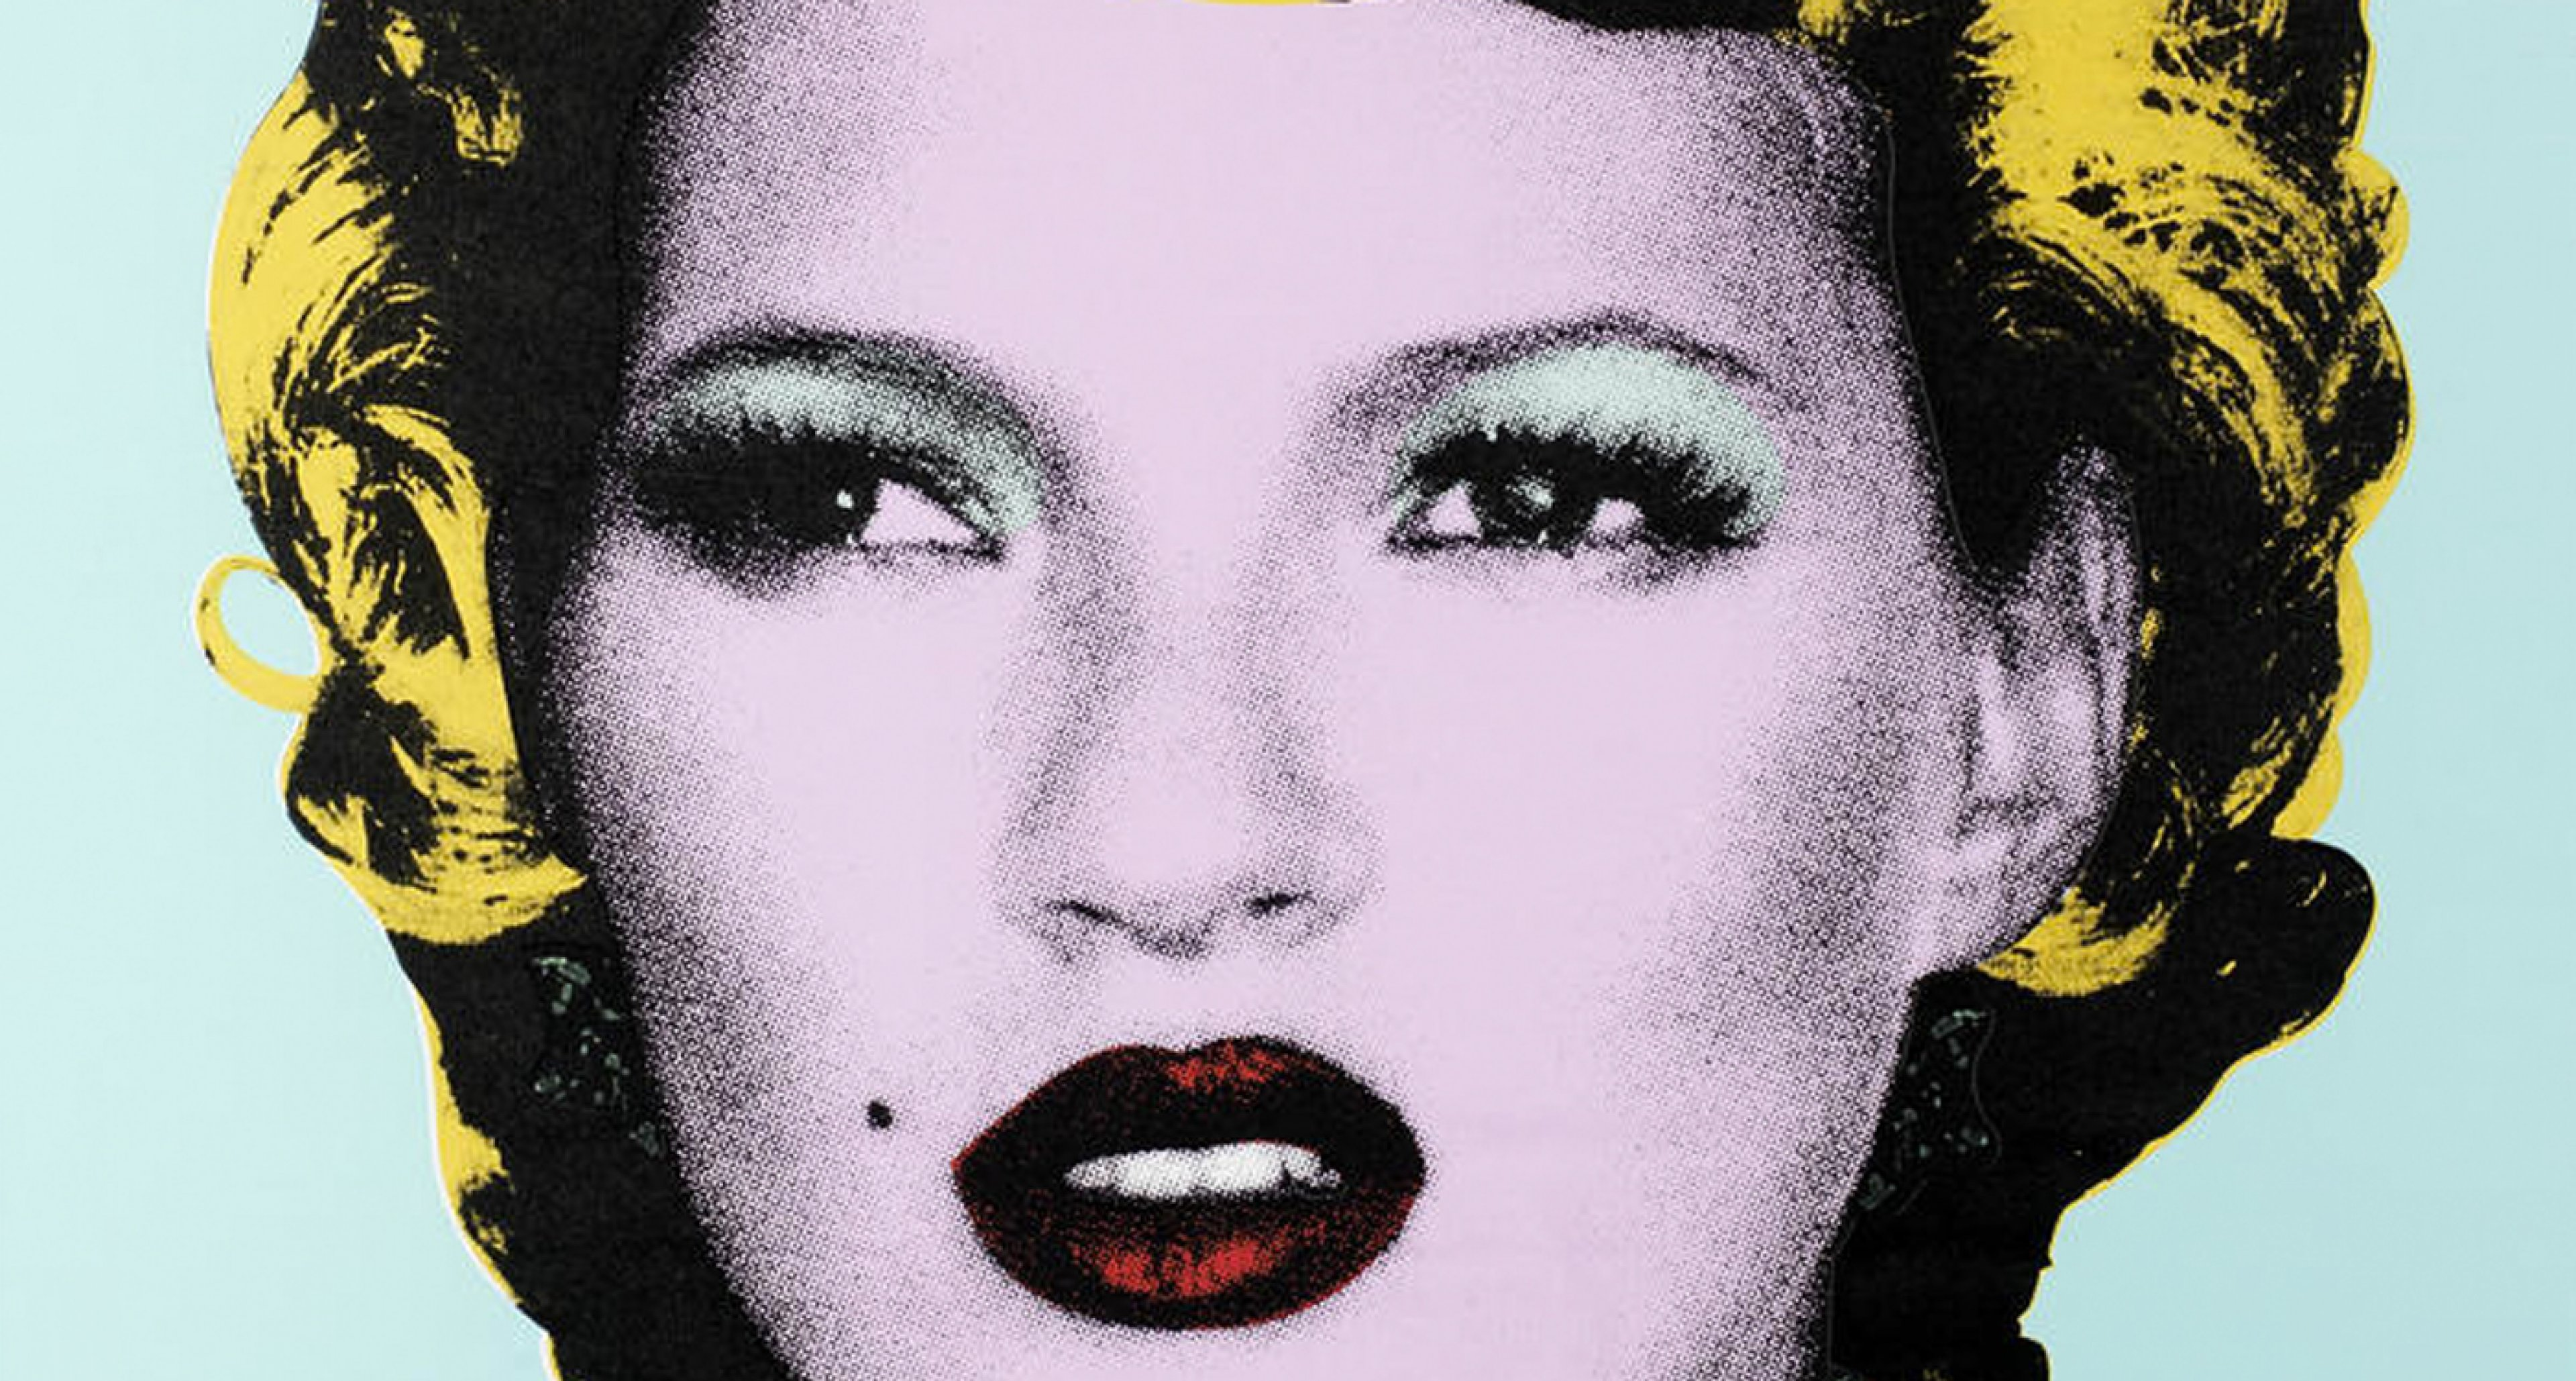 Banksy 'Kate Moss' (2005), estimate £25,000 - 35,000.